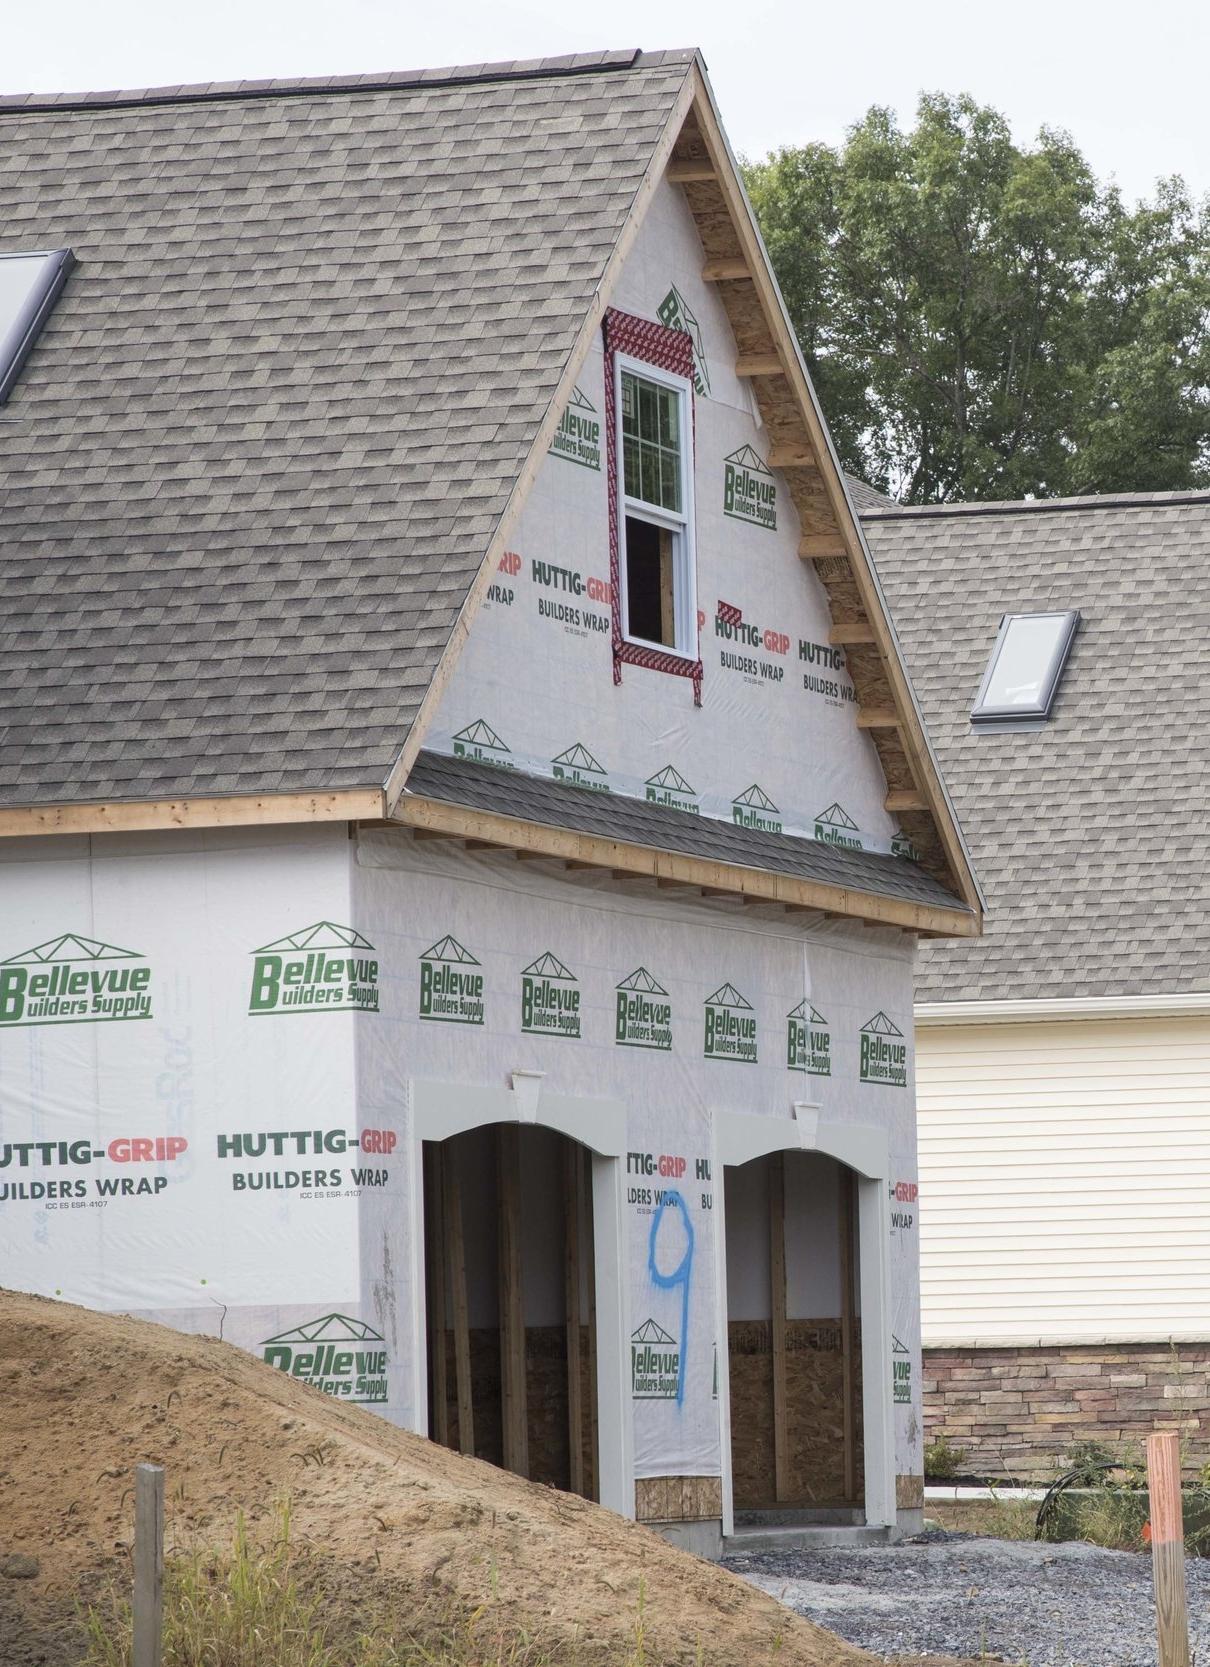 BDC Builders' Construction Features - • 2x6 Exterior Walls w/ Fiberboard Sheathing• 3/4